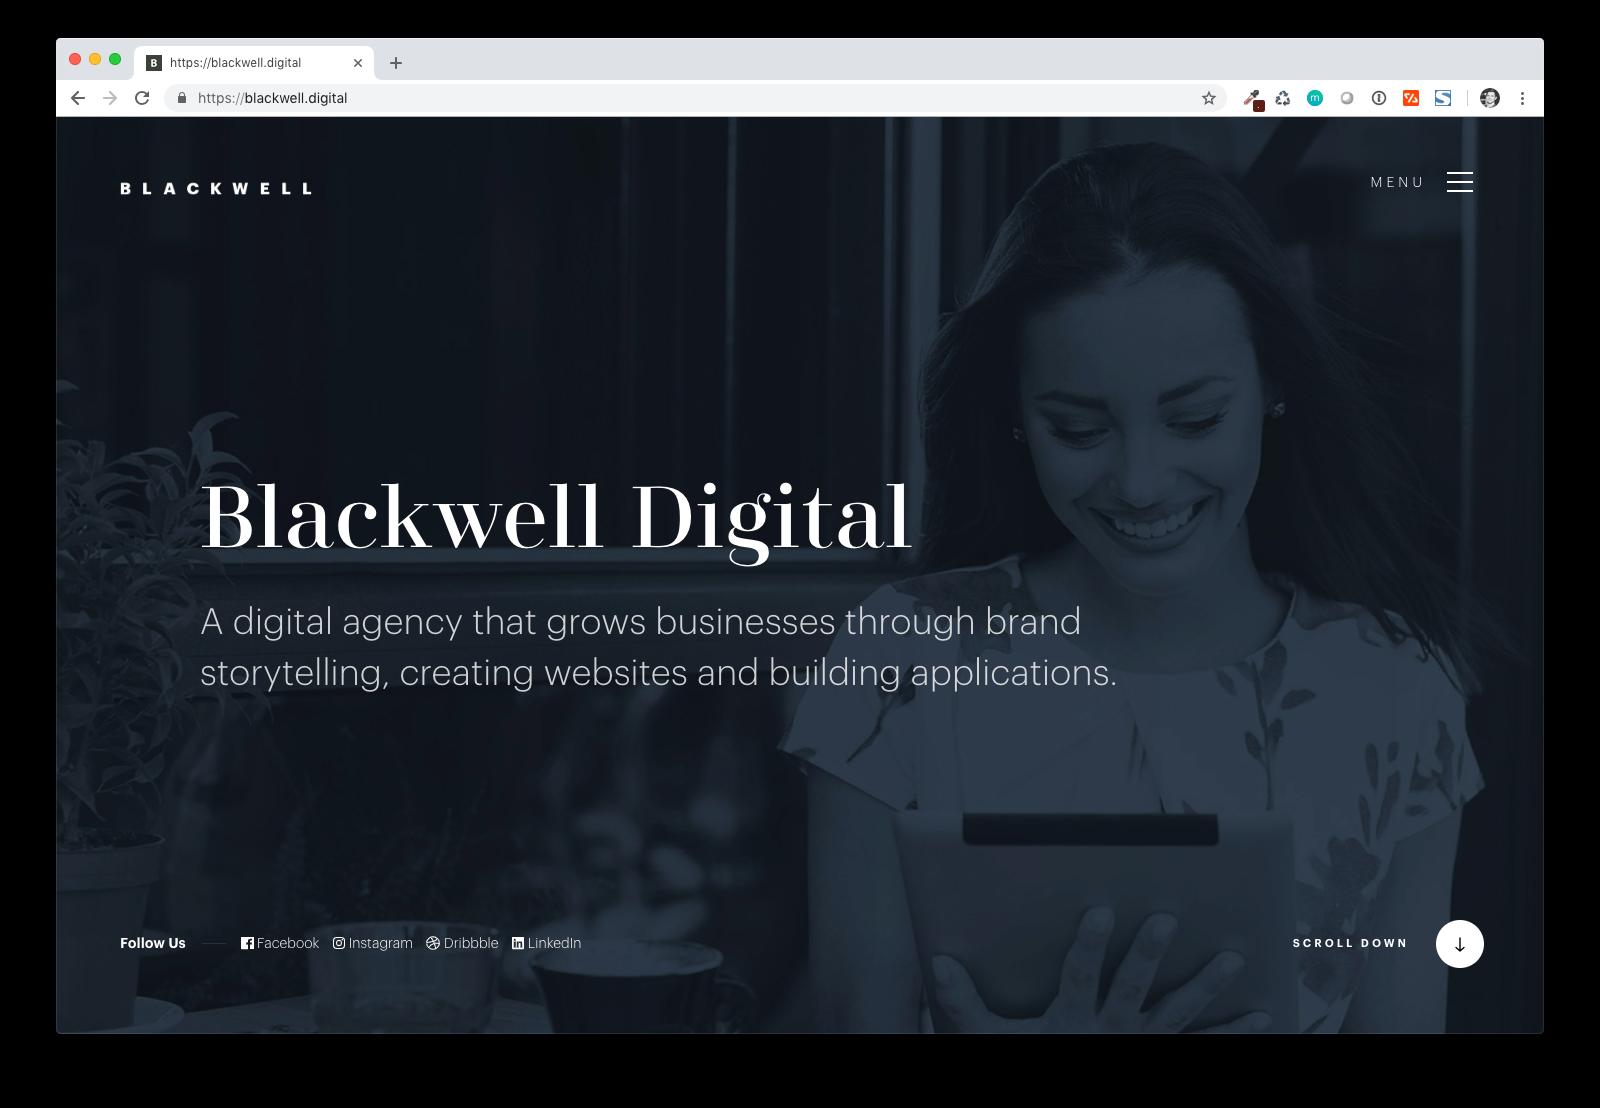 blackwelldigital